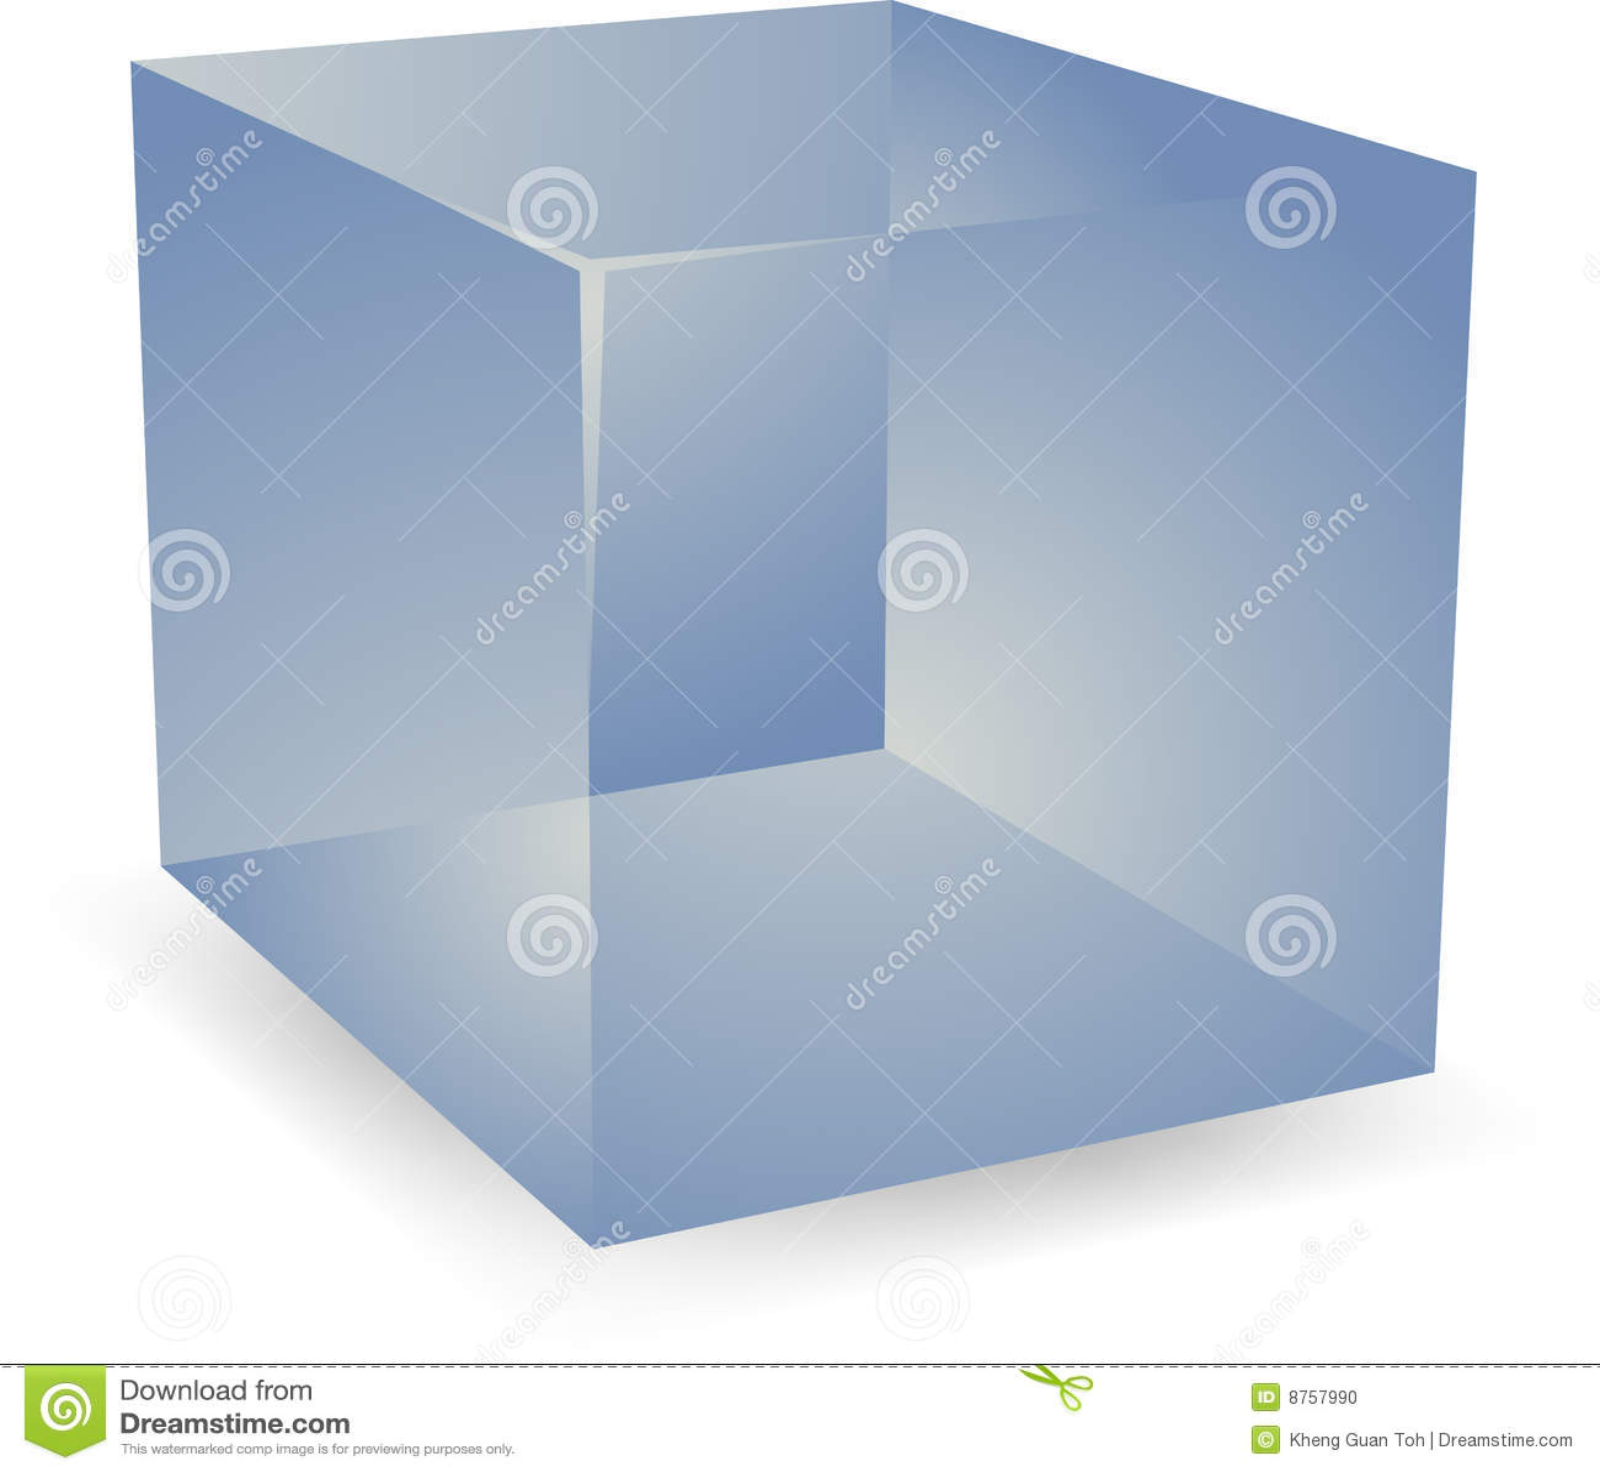 Blank cube translucent 3d shape design illustration.